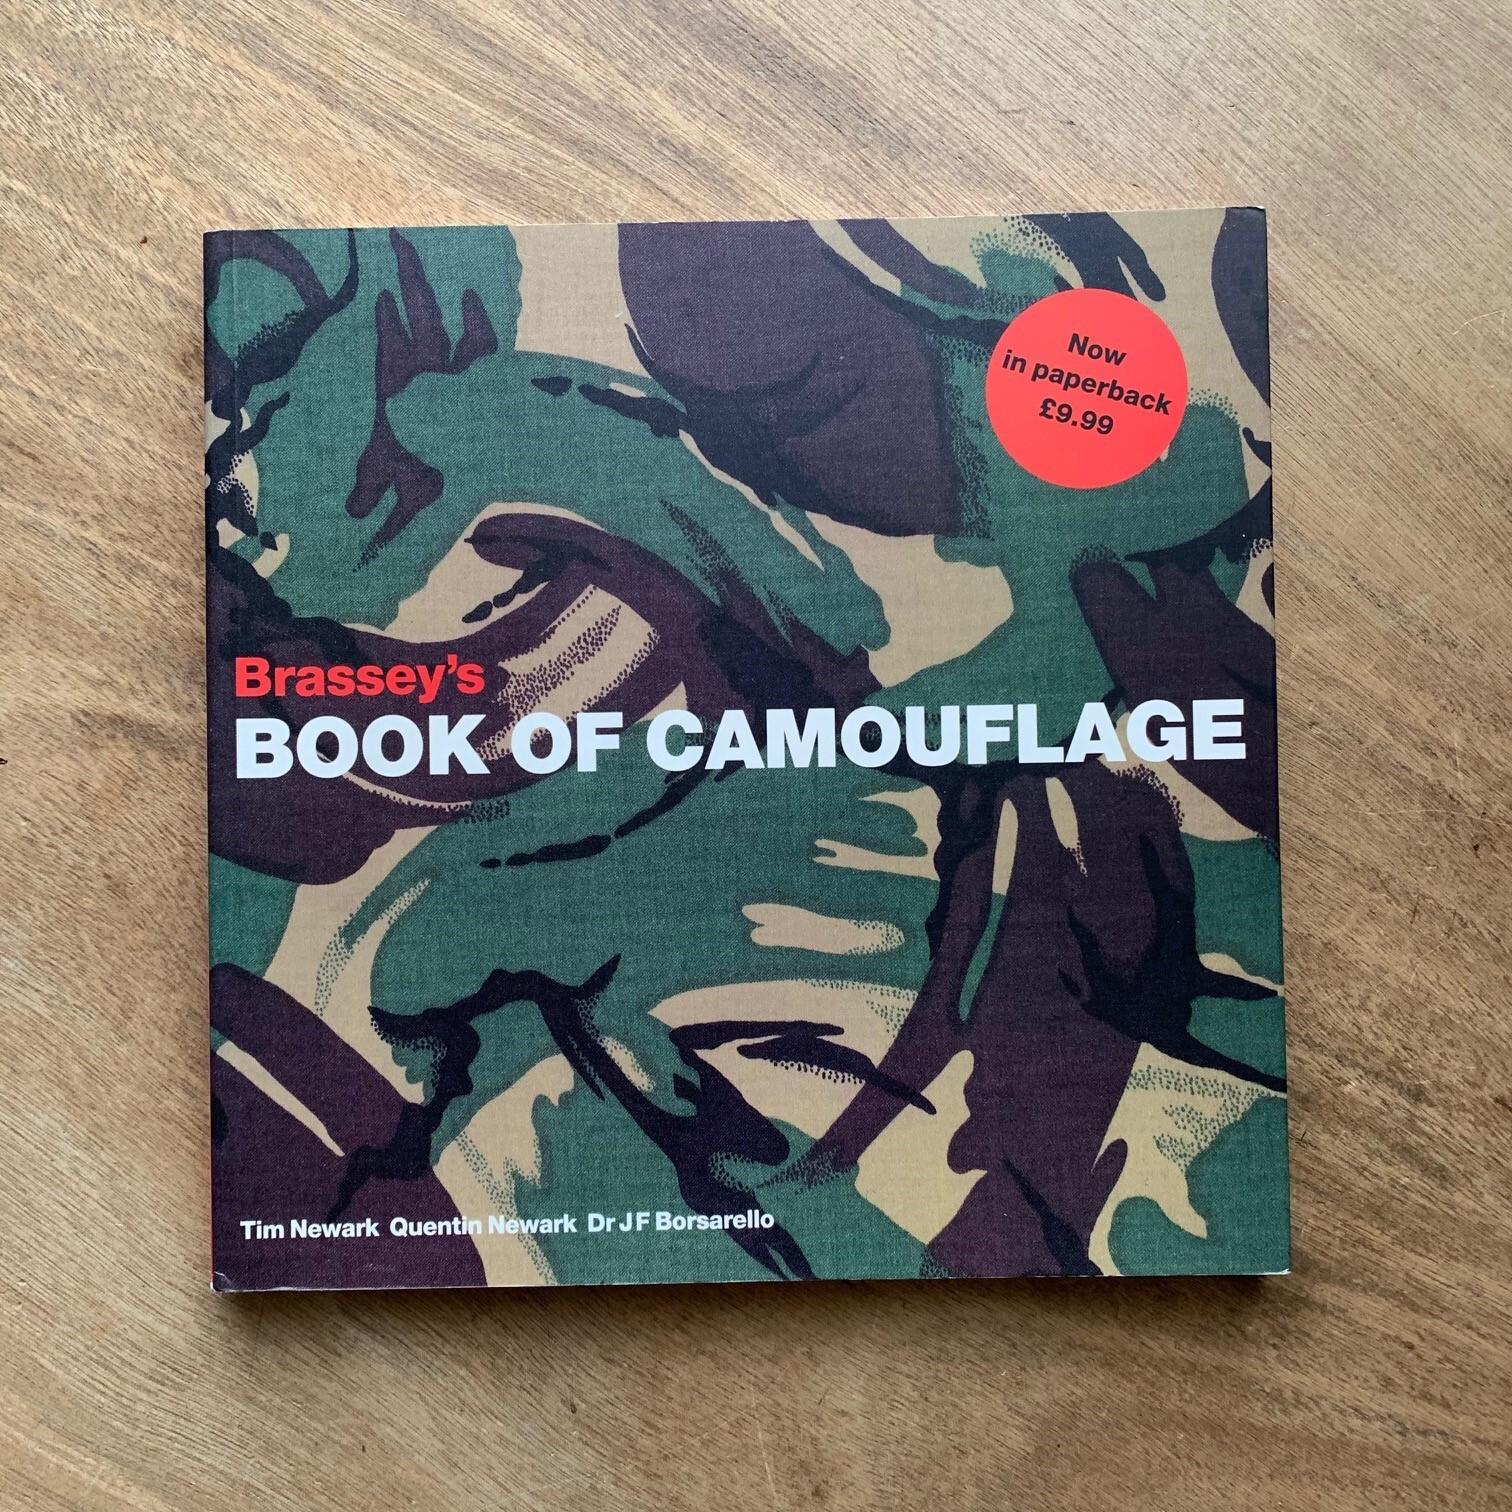 Brassey's Book of Camouflage  /  Tim Newark